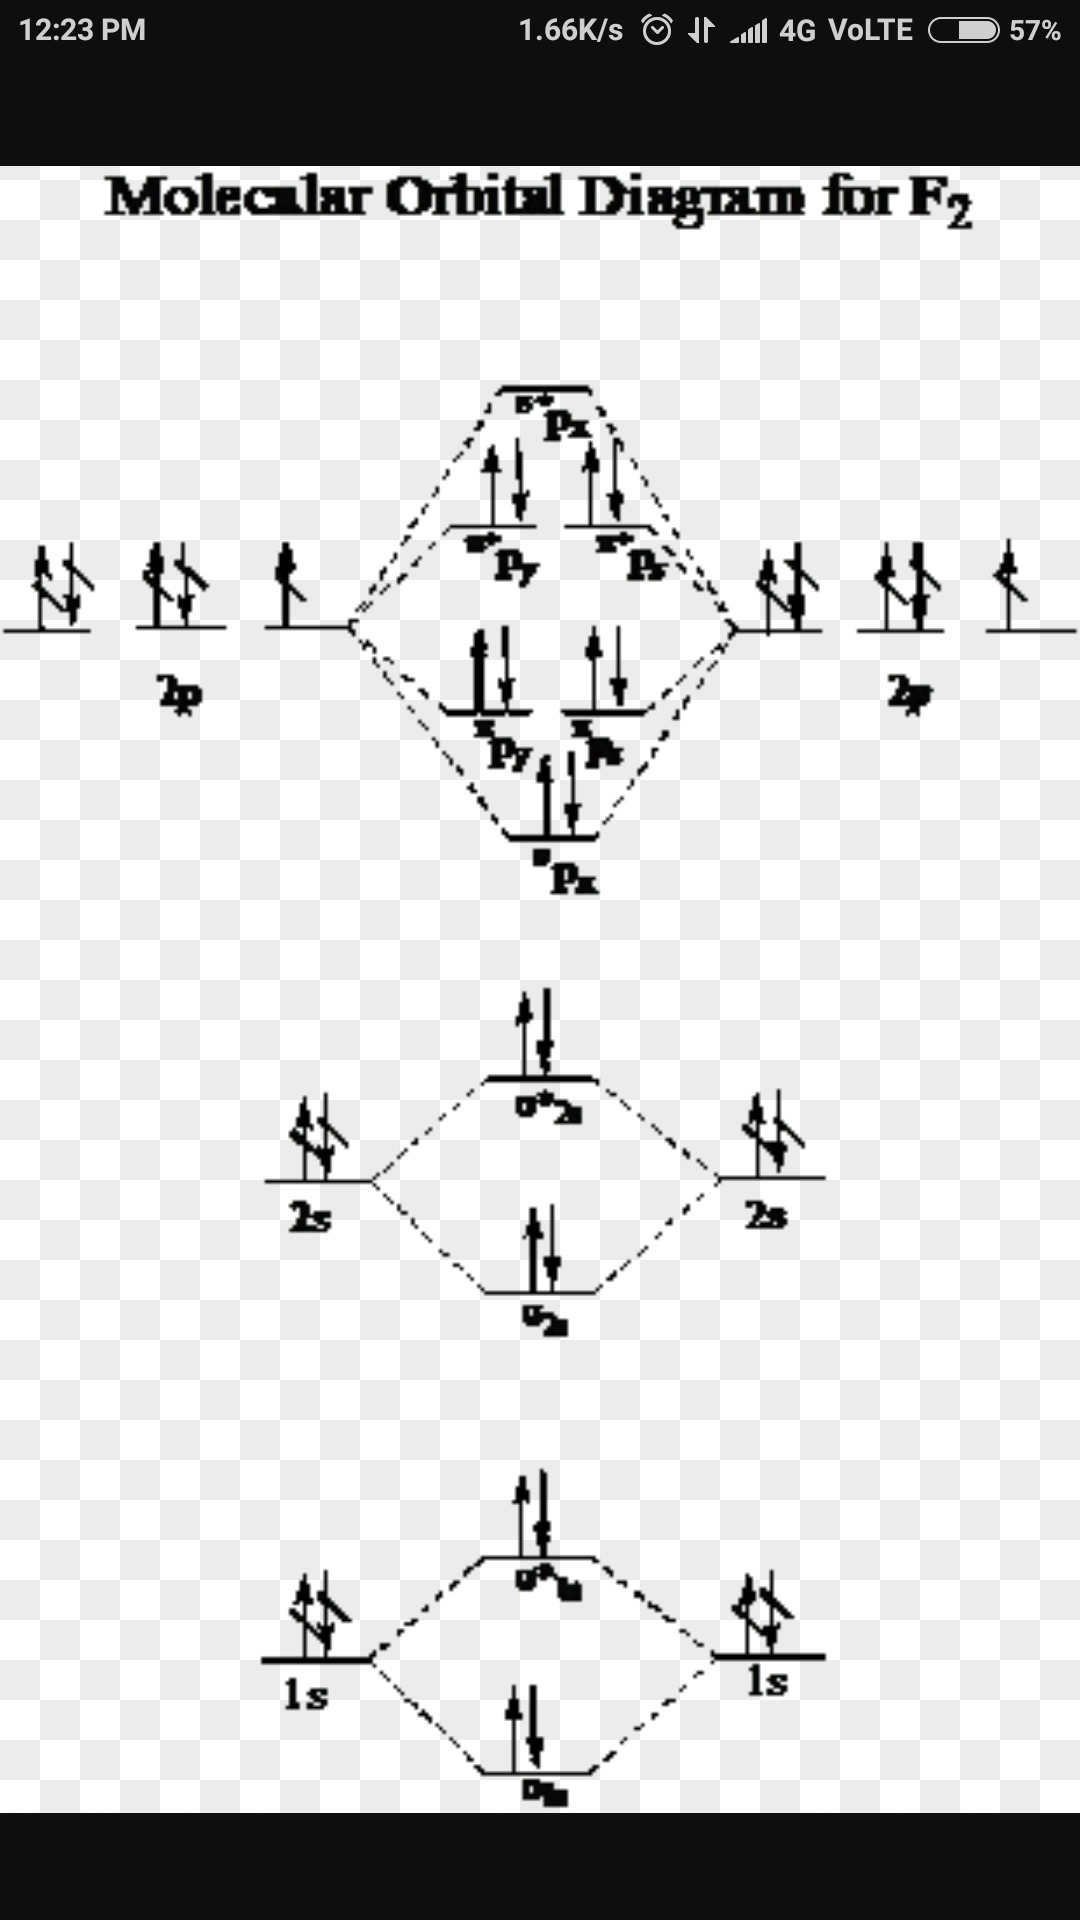 Molecular Orbital Diagram Draw The Molecular Orbital Diagram For F2 And Find Out The Bond